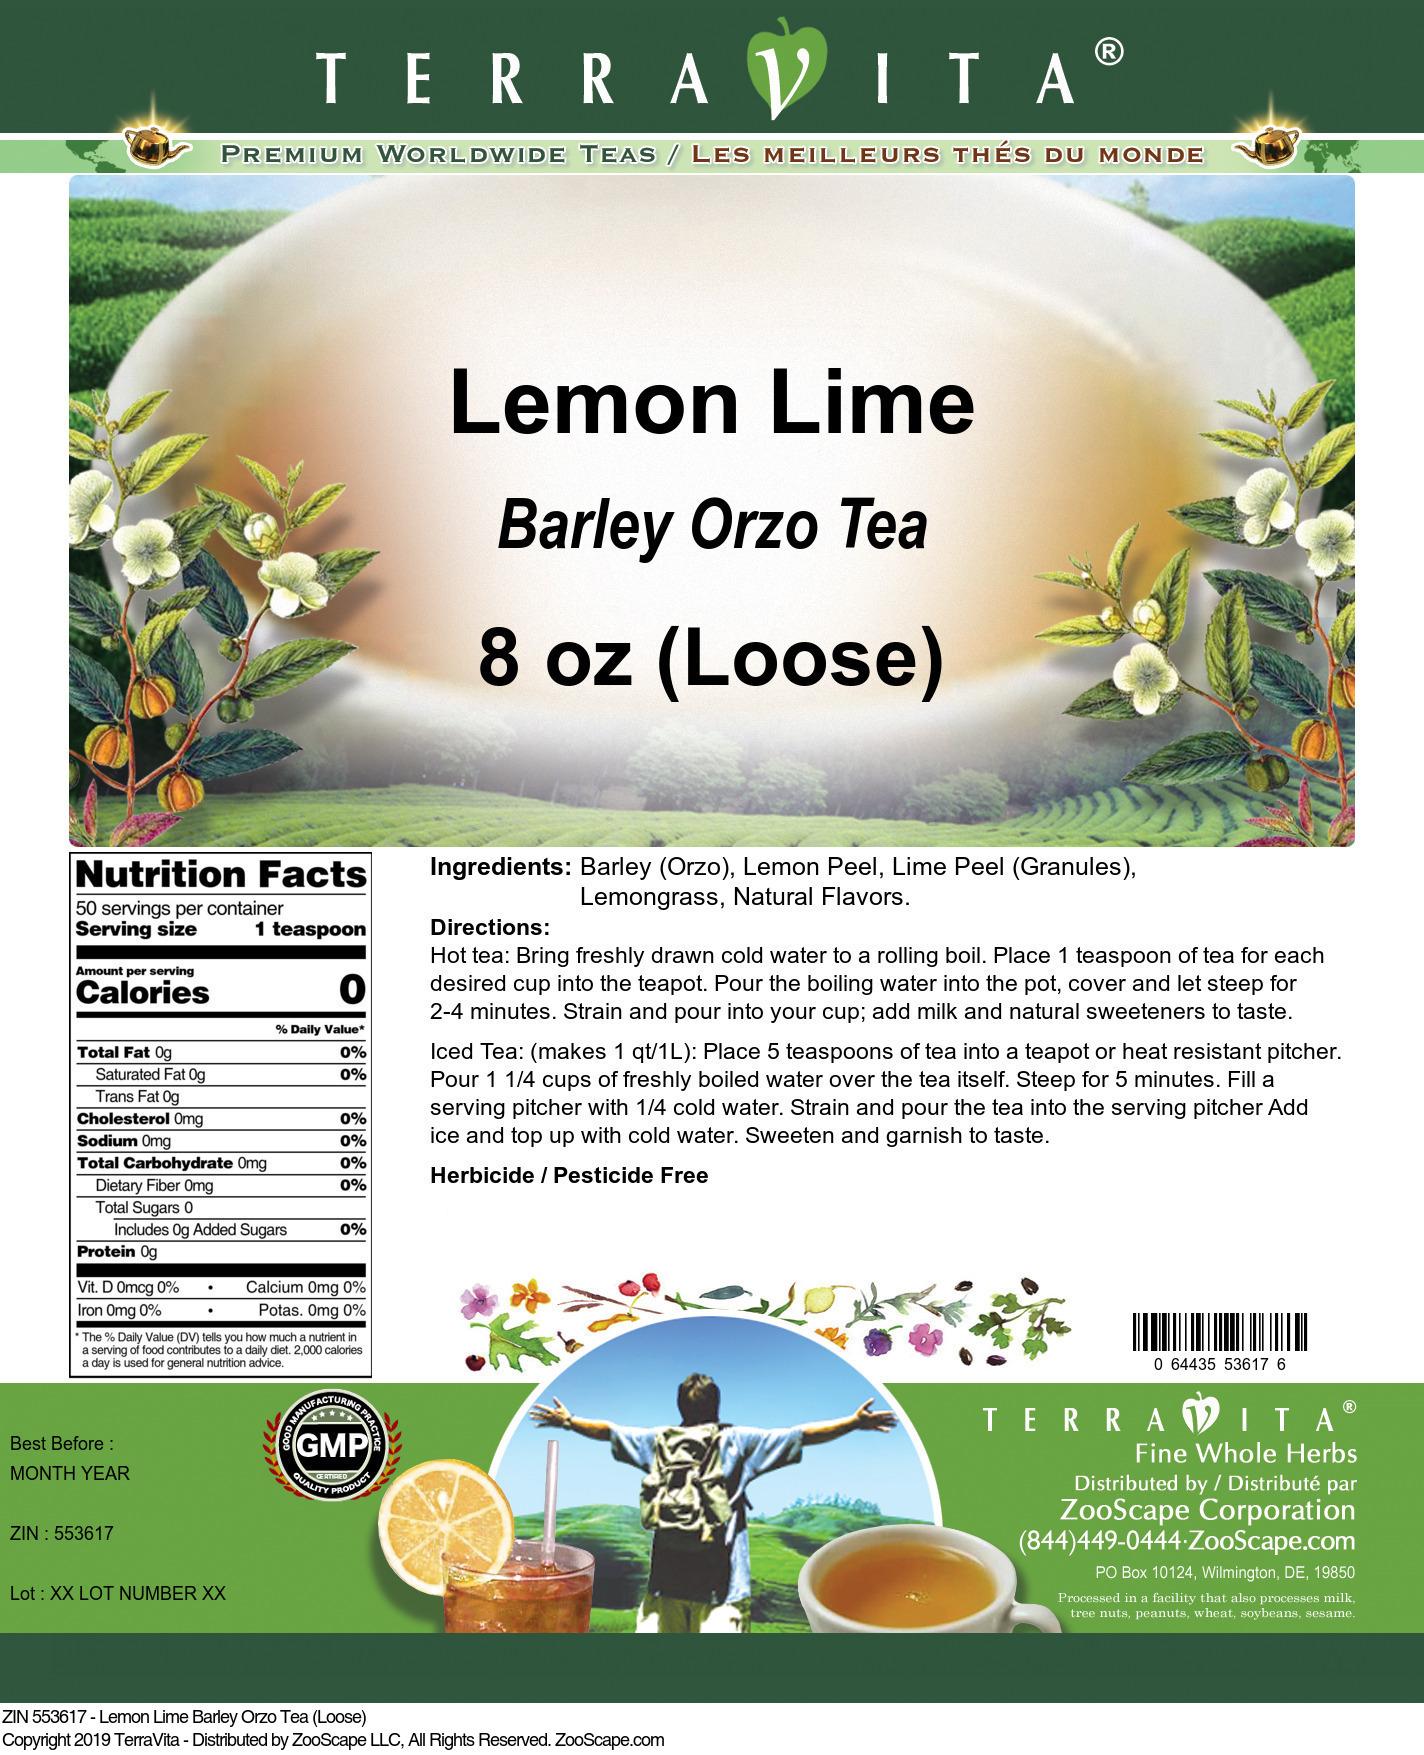 Lemon Lime Barley Orzo